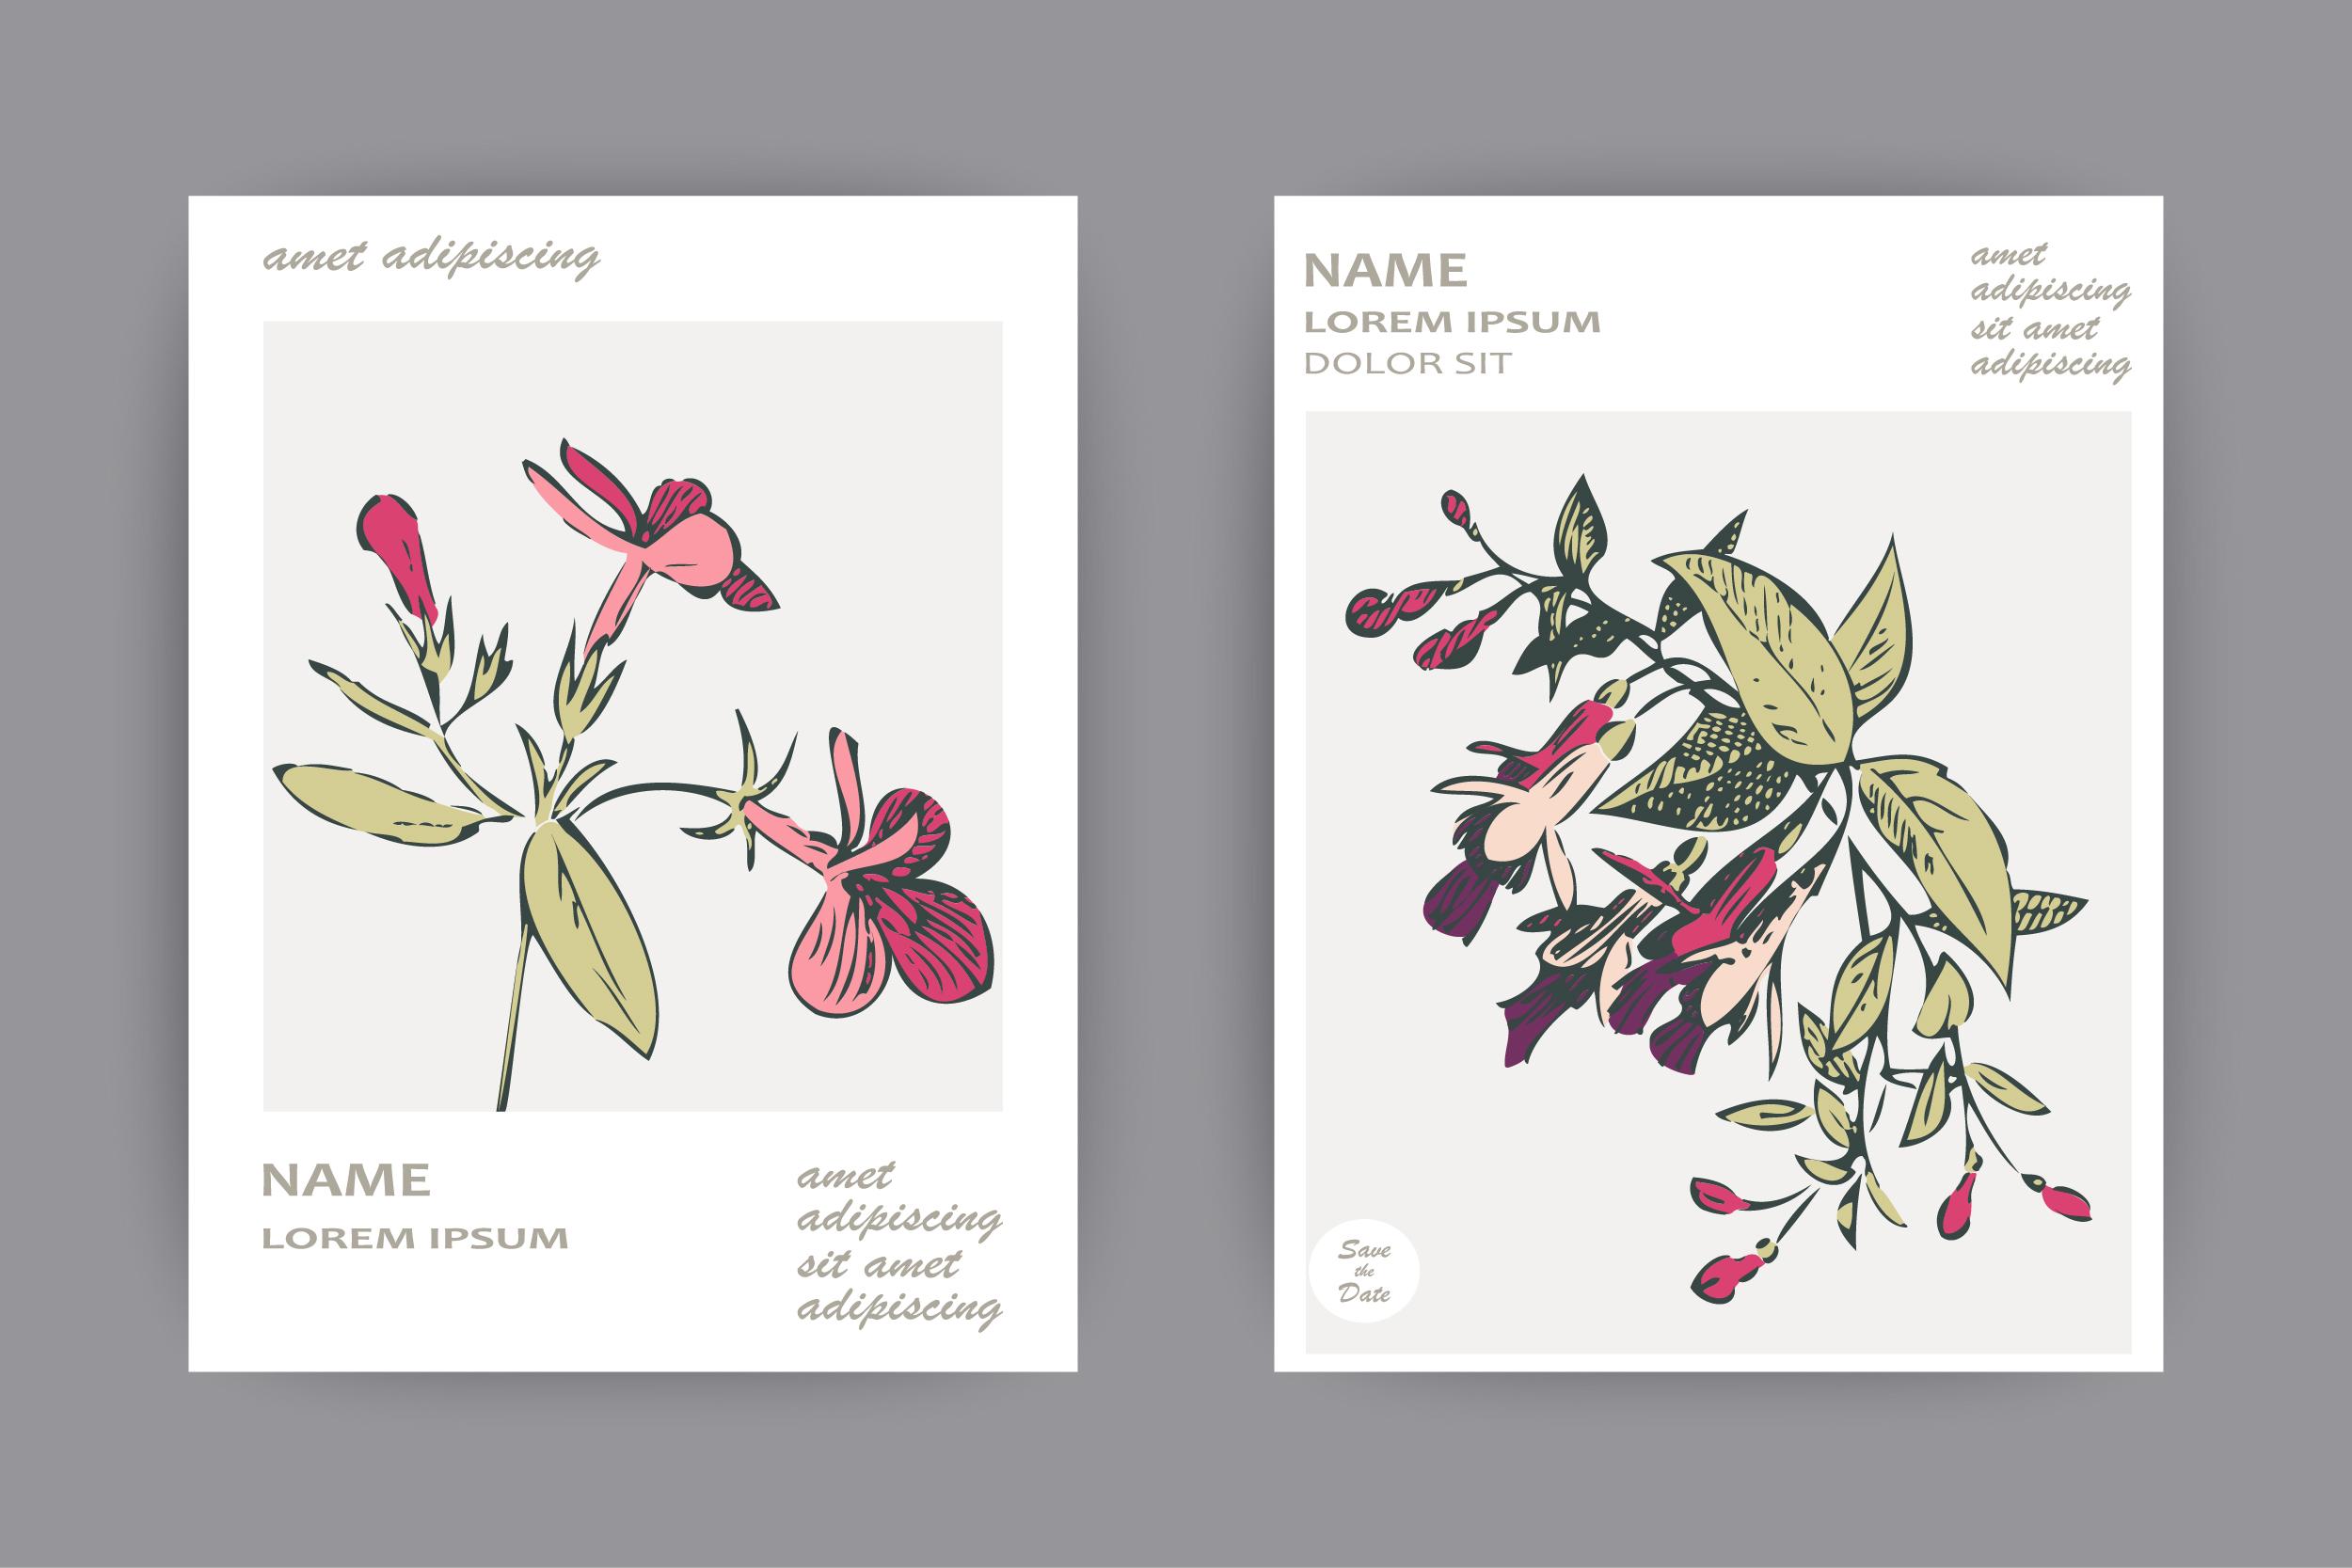 Fuchsia flowers wedding invitation card template design example image 4